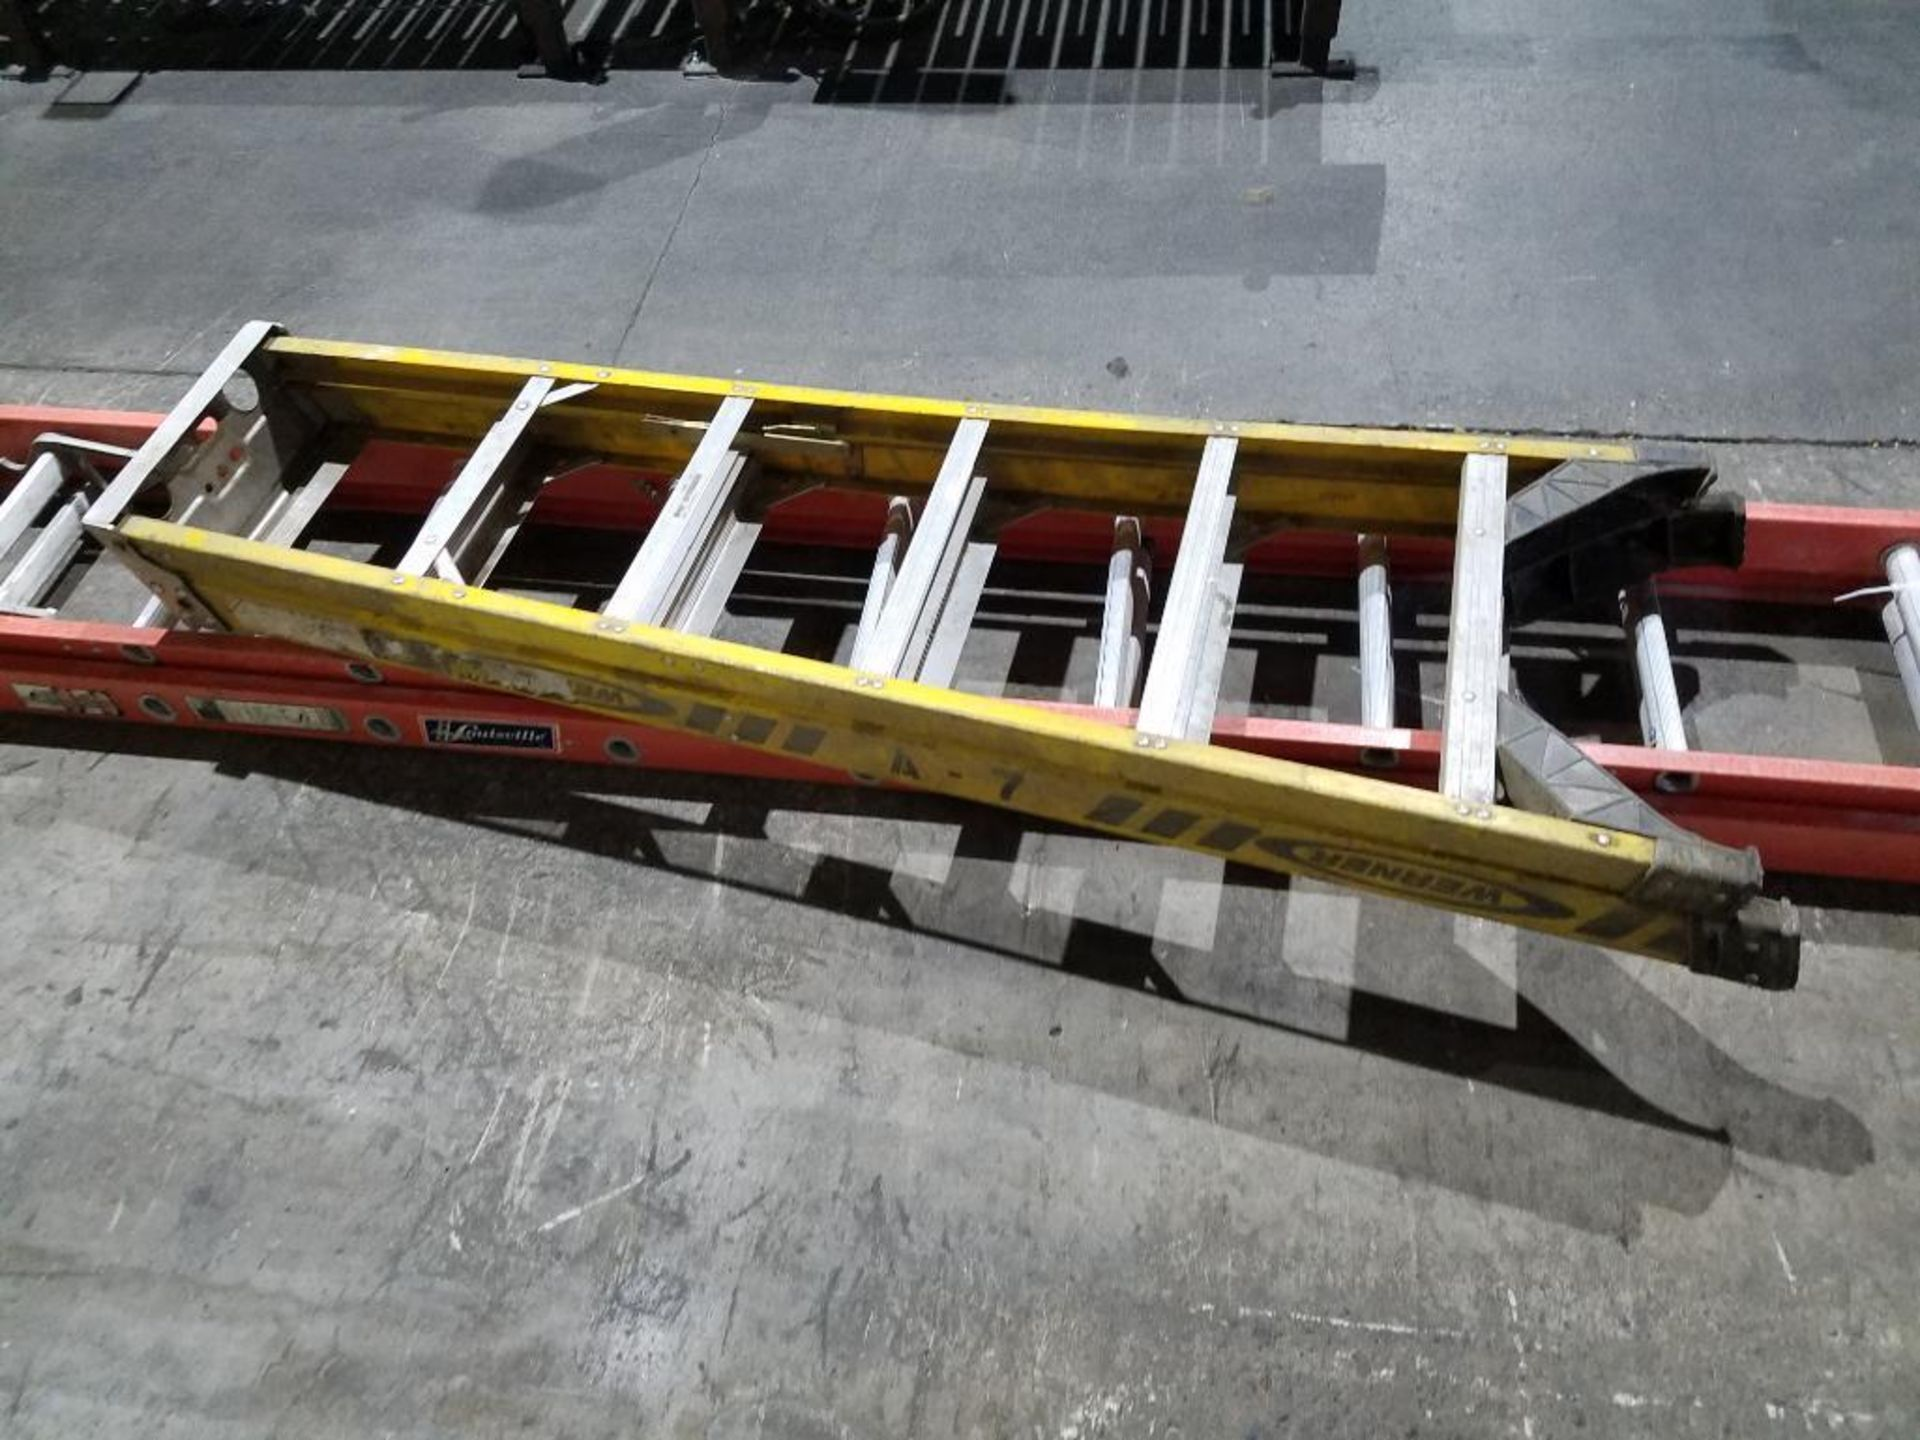 Werner 6 ft. step ladder and Louisville 32 ft. extension ladder - Image 2 of 3